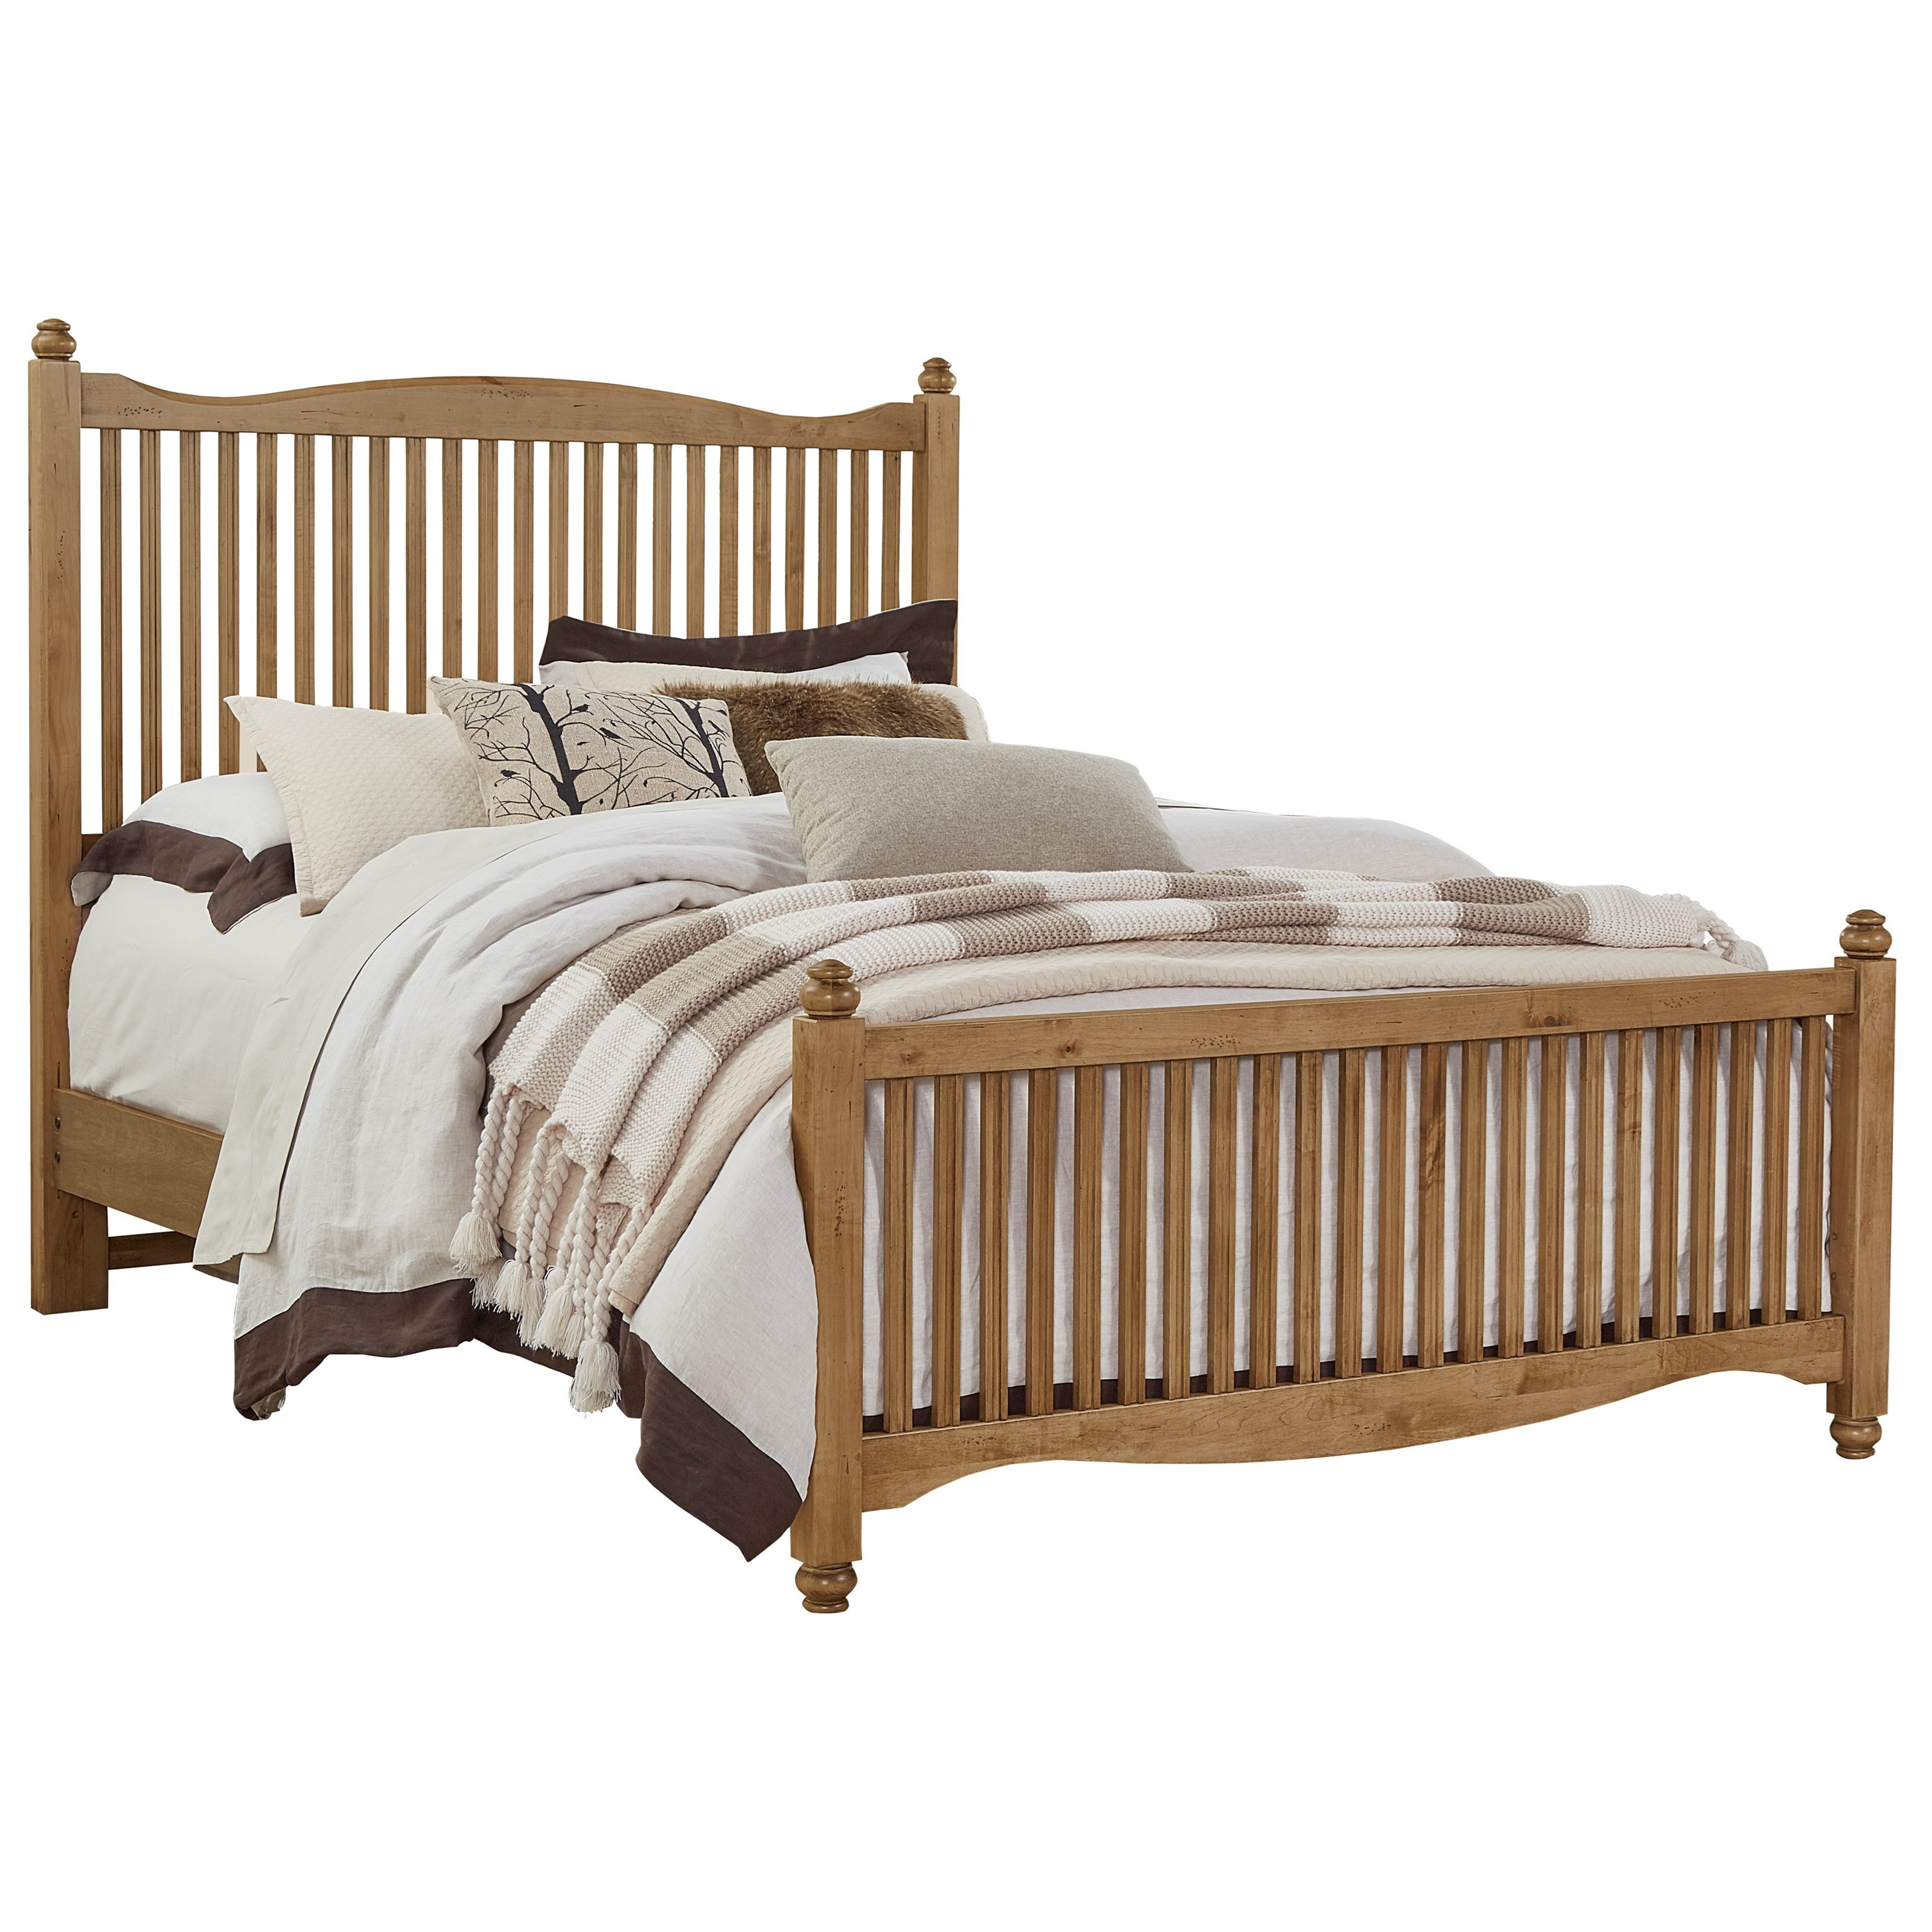 Vaughan Bassett American Maple Solid Wood Twin Slat Bed